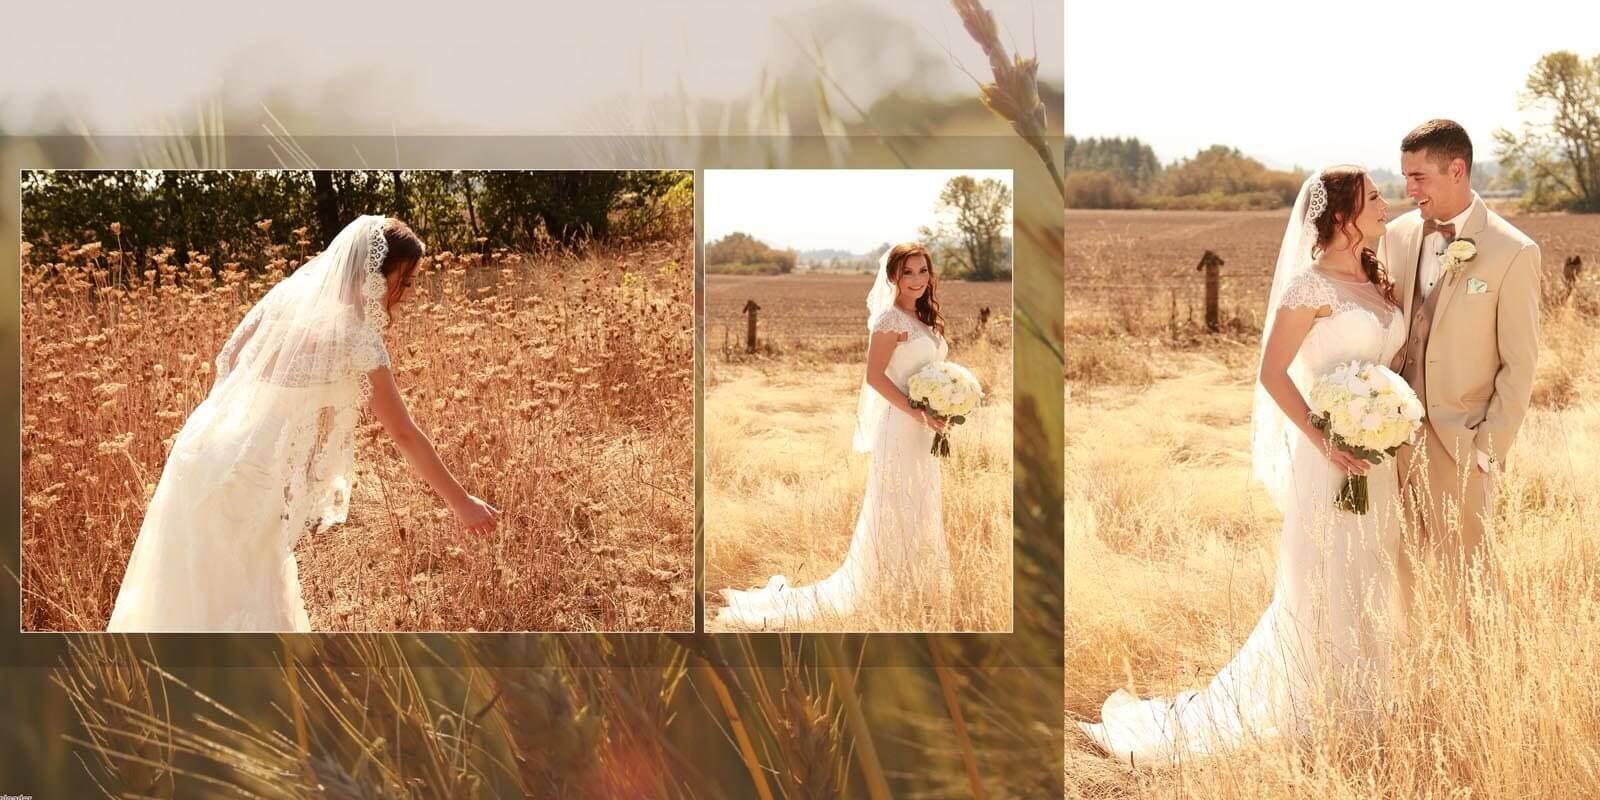 Jasper-House-Farm-Outdoor-Wedding-Lane-County-Oregon-photographers-020-021.jpg